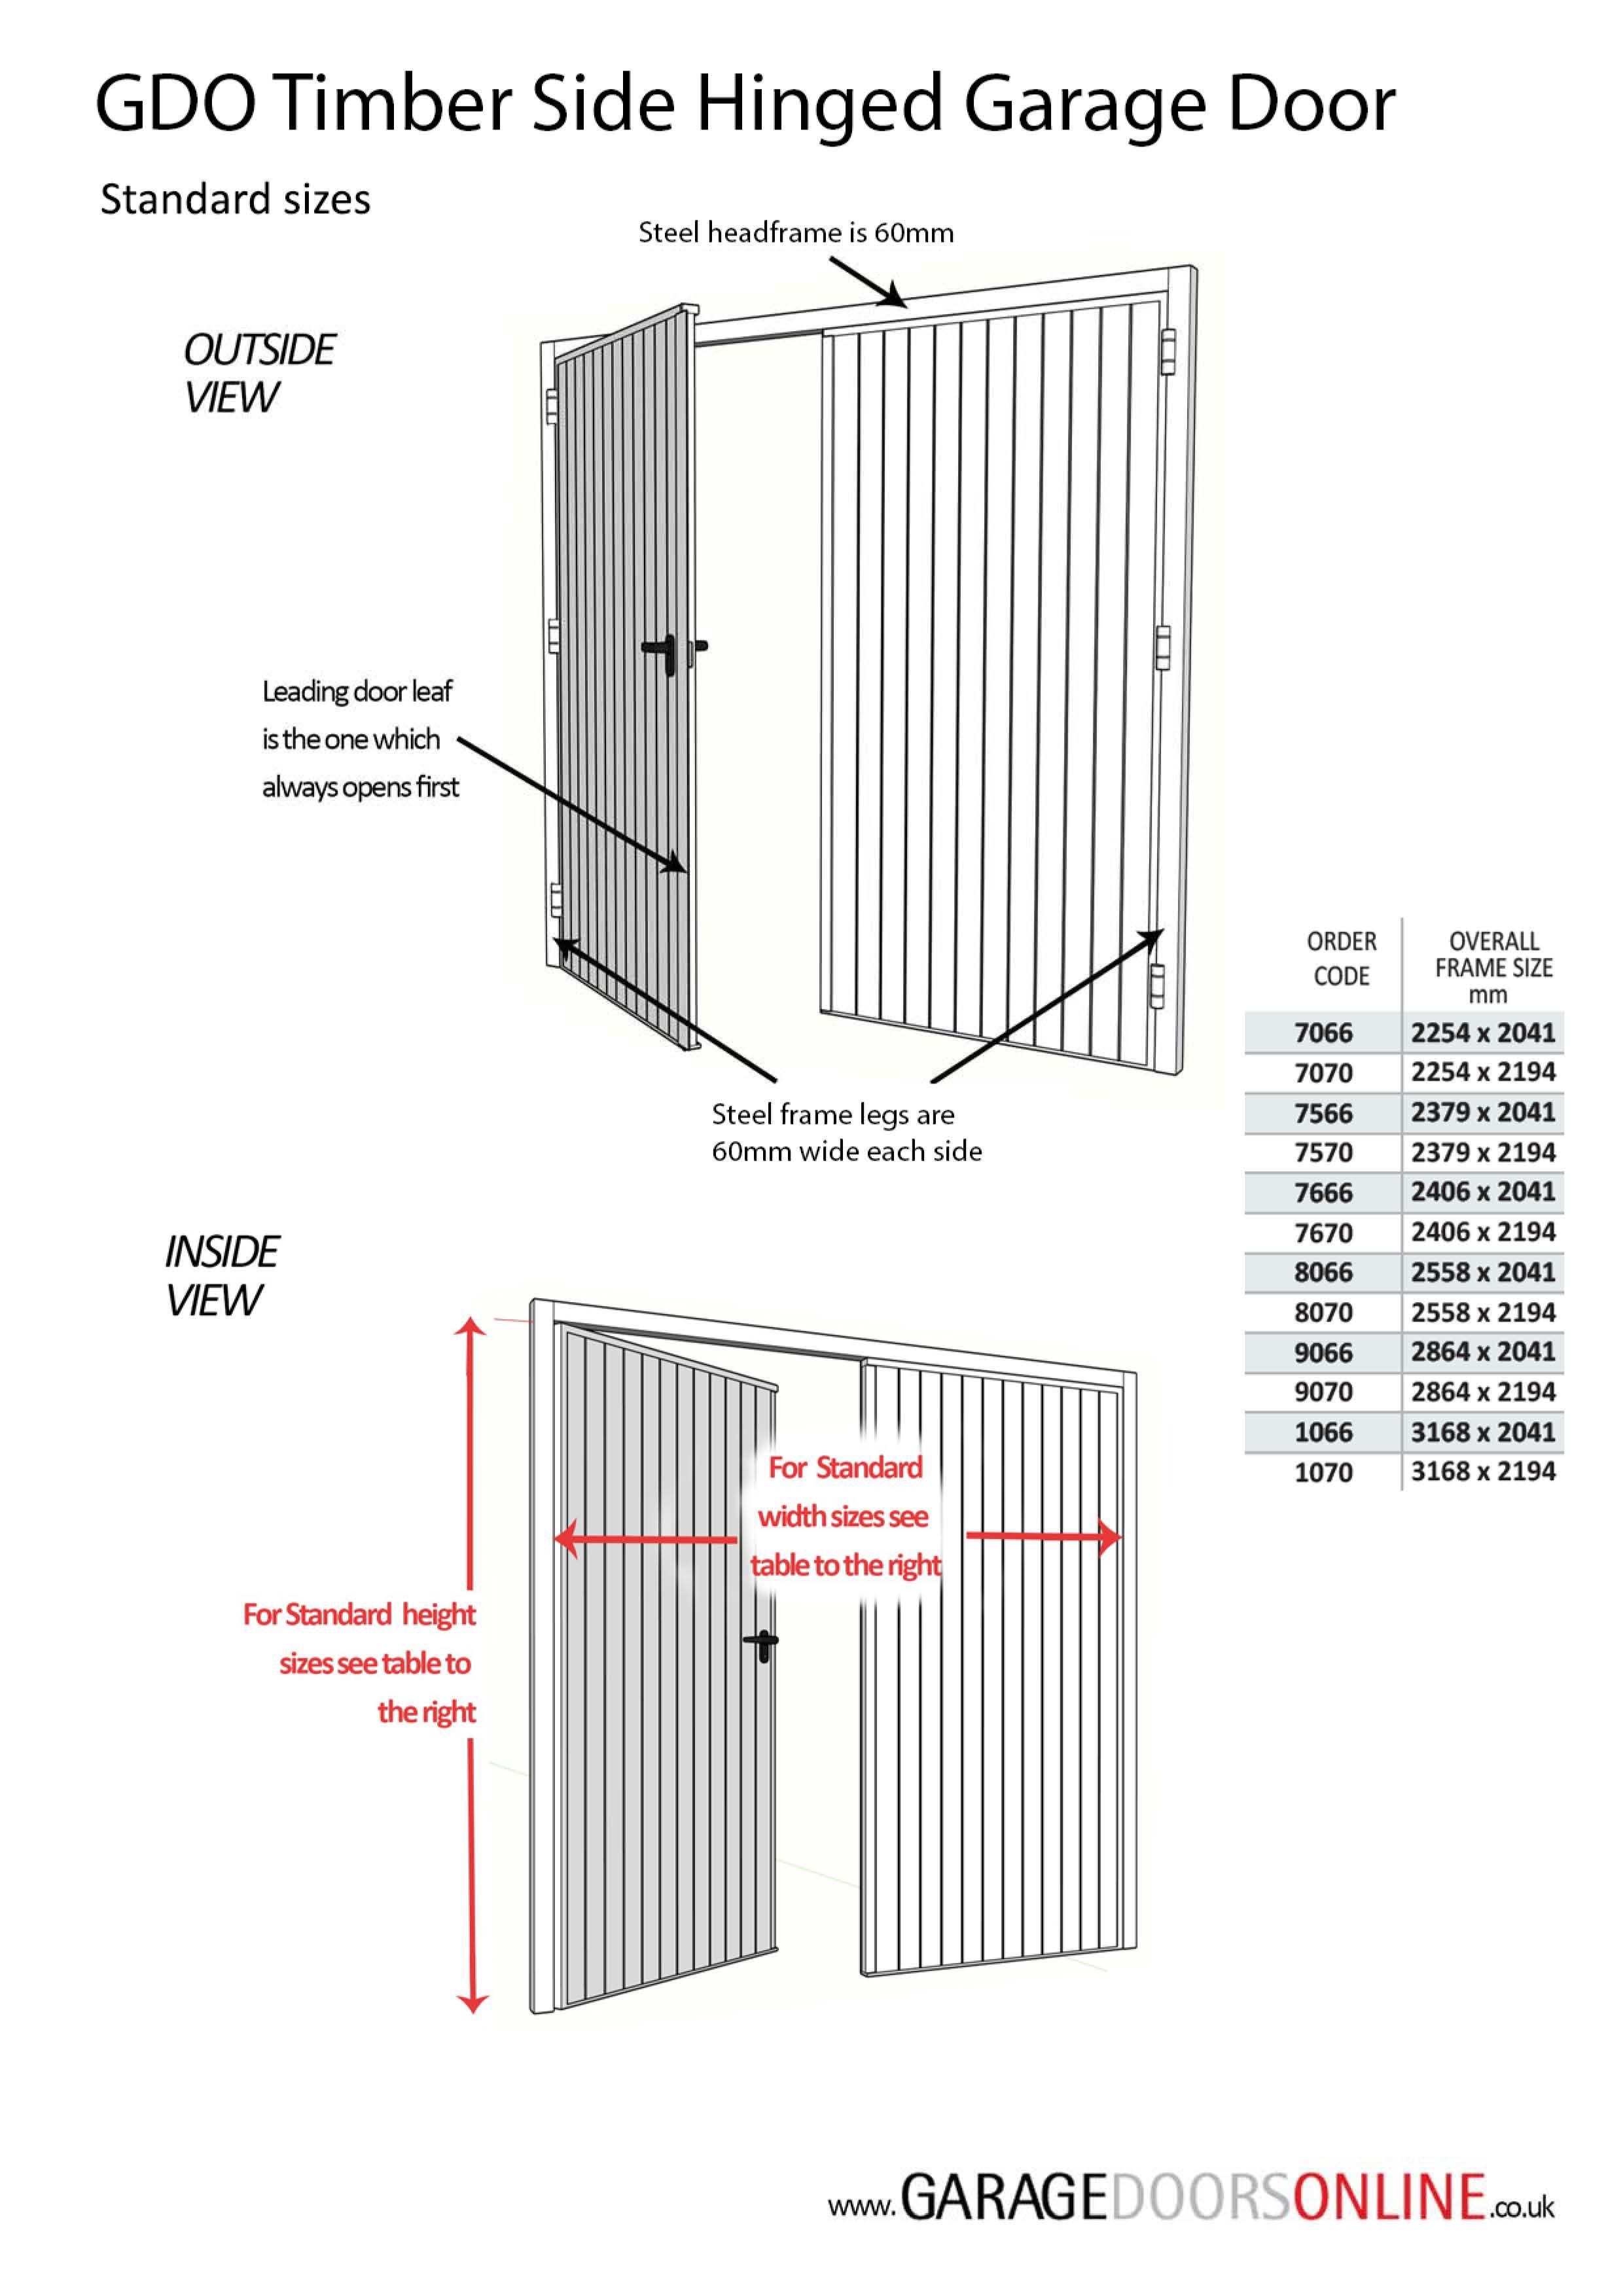 GDO Standard size Timber Side Hinged garage door Measuring Guide